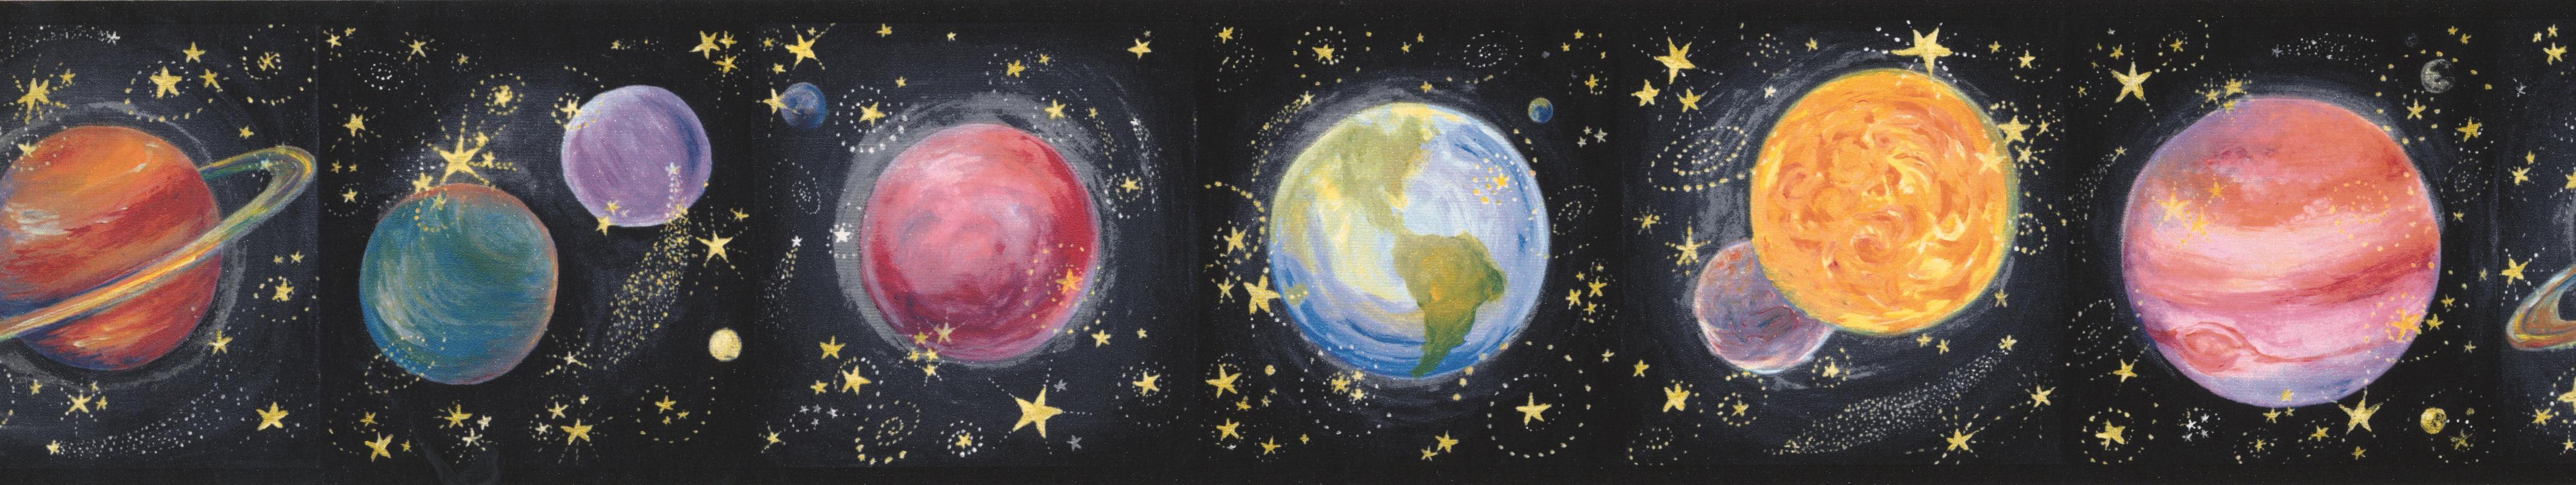 Solar System Planets On Black Wallpaper Border For Kids